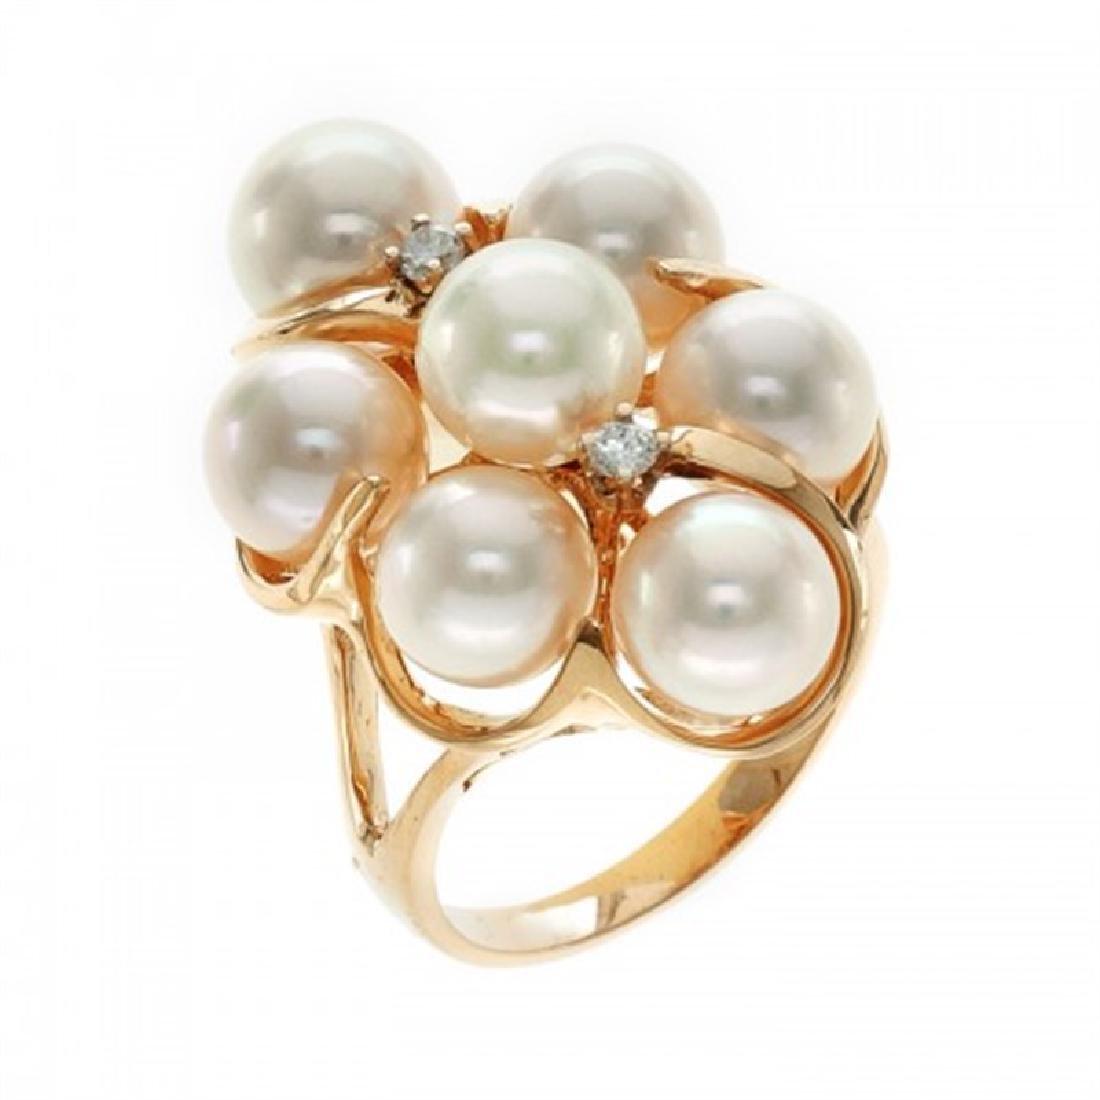 6.5-7.0mm Japanese Akoya Pearl Ring with Diamonds